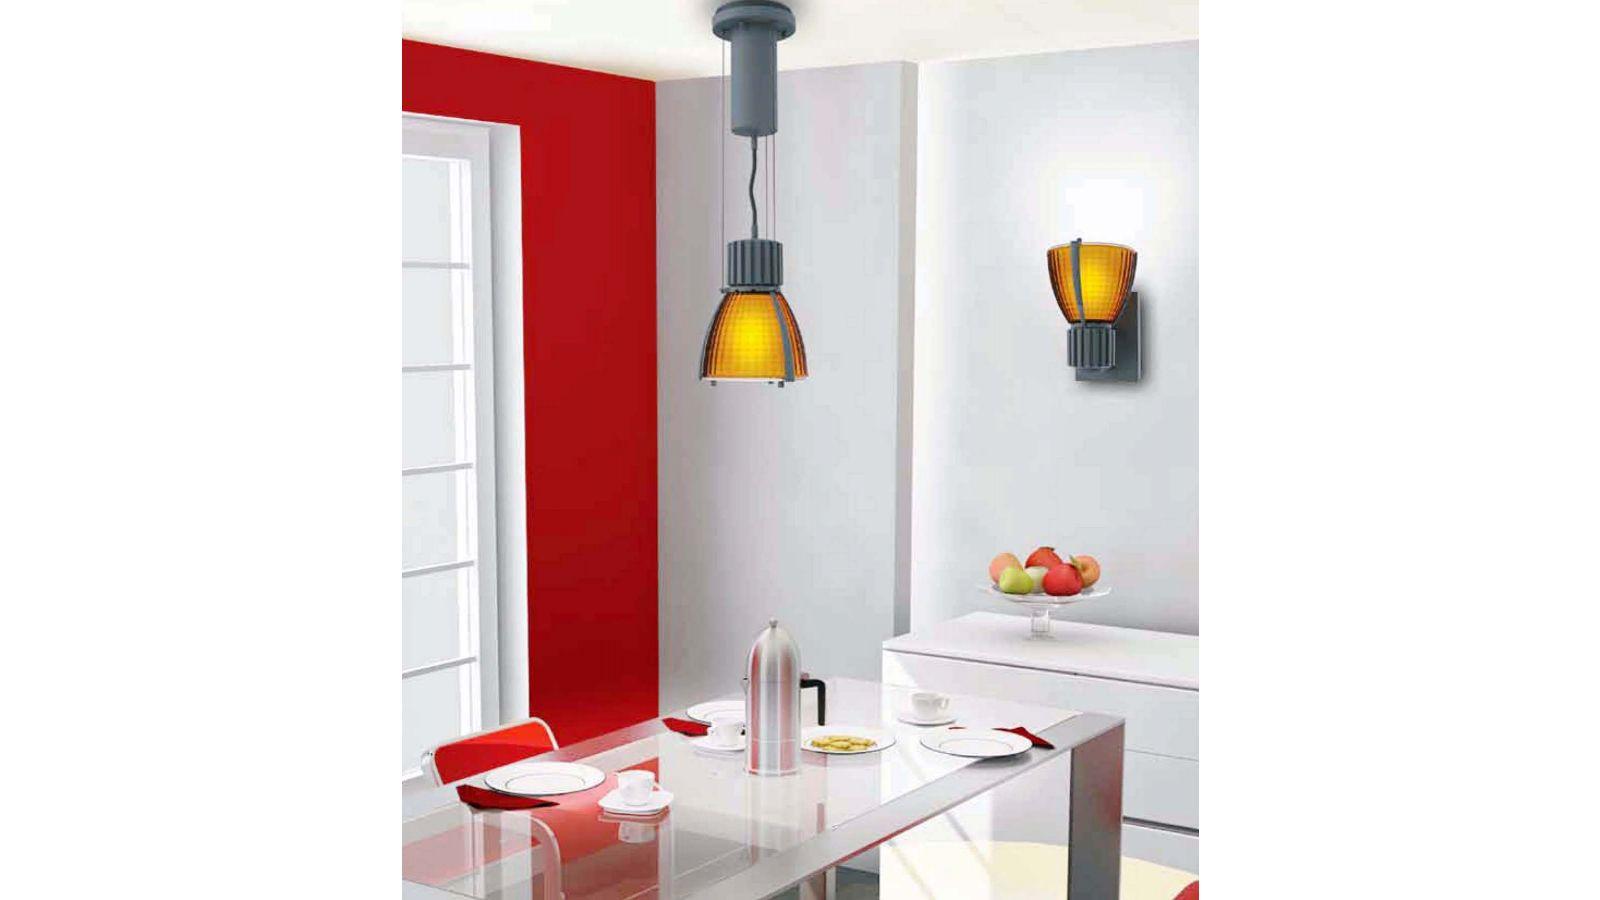 Architectural LED Pendants And Sconces